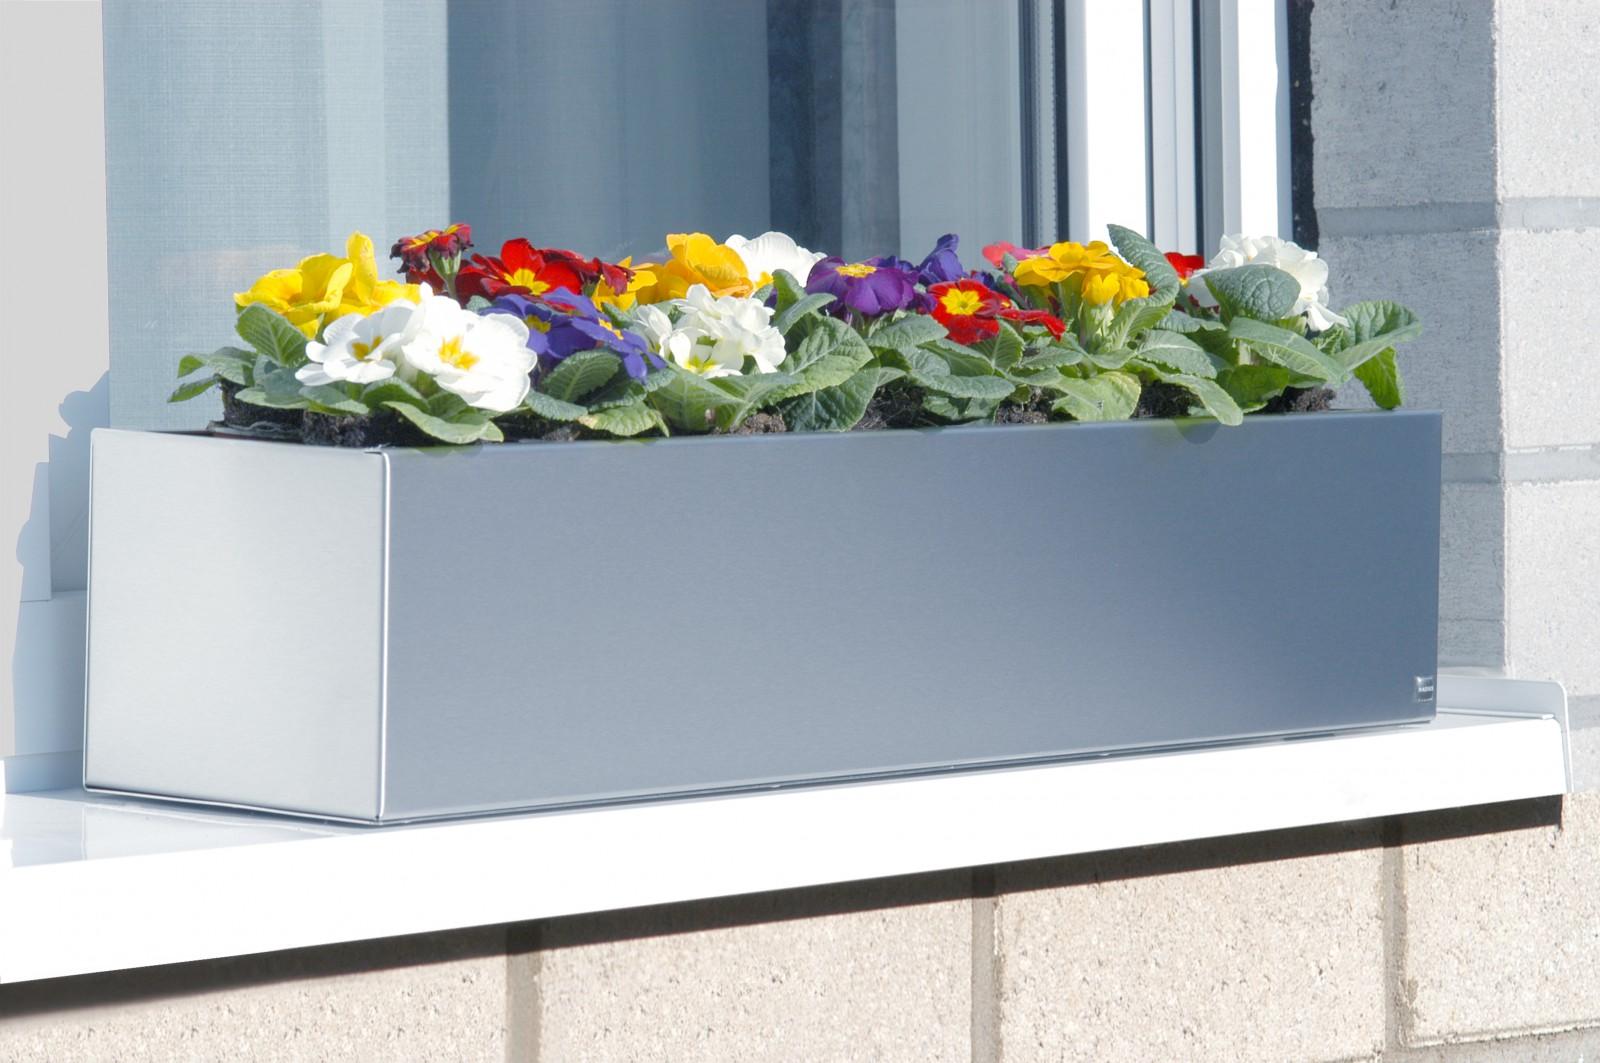 radius edelstahl blumenkasten pflanzkasten balkon 100 cm. Black Bedroom Furniture Sets. Home Design Ideas